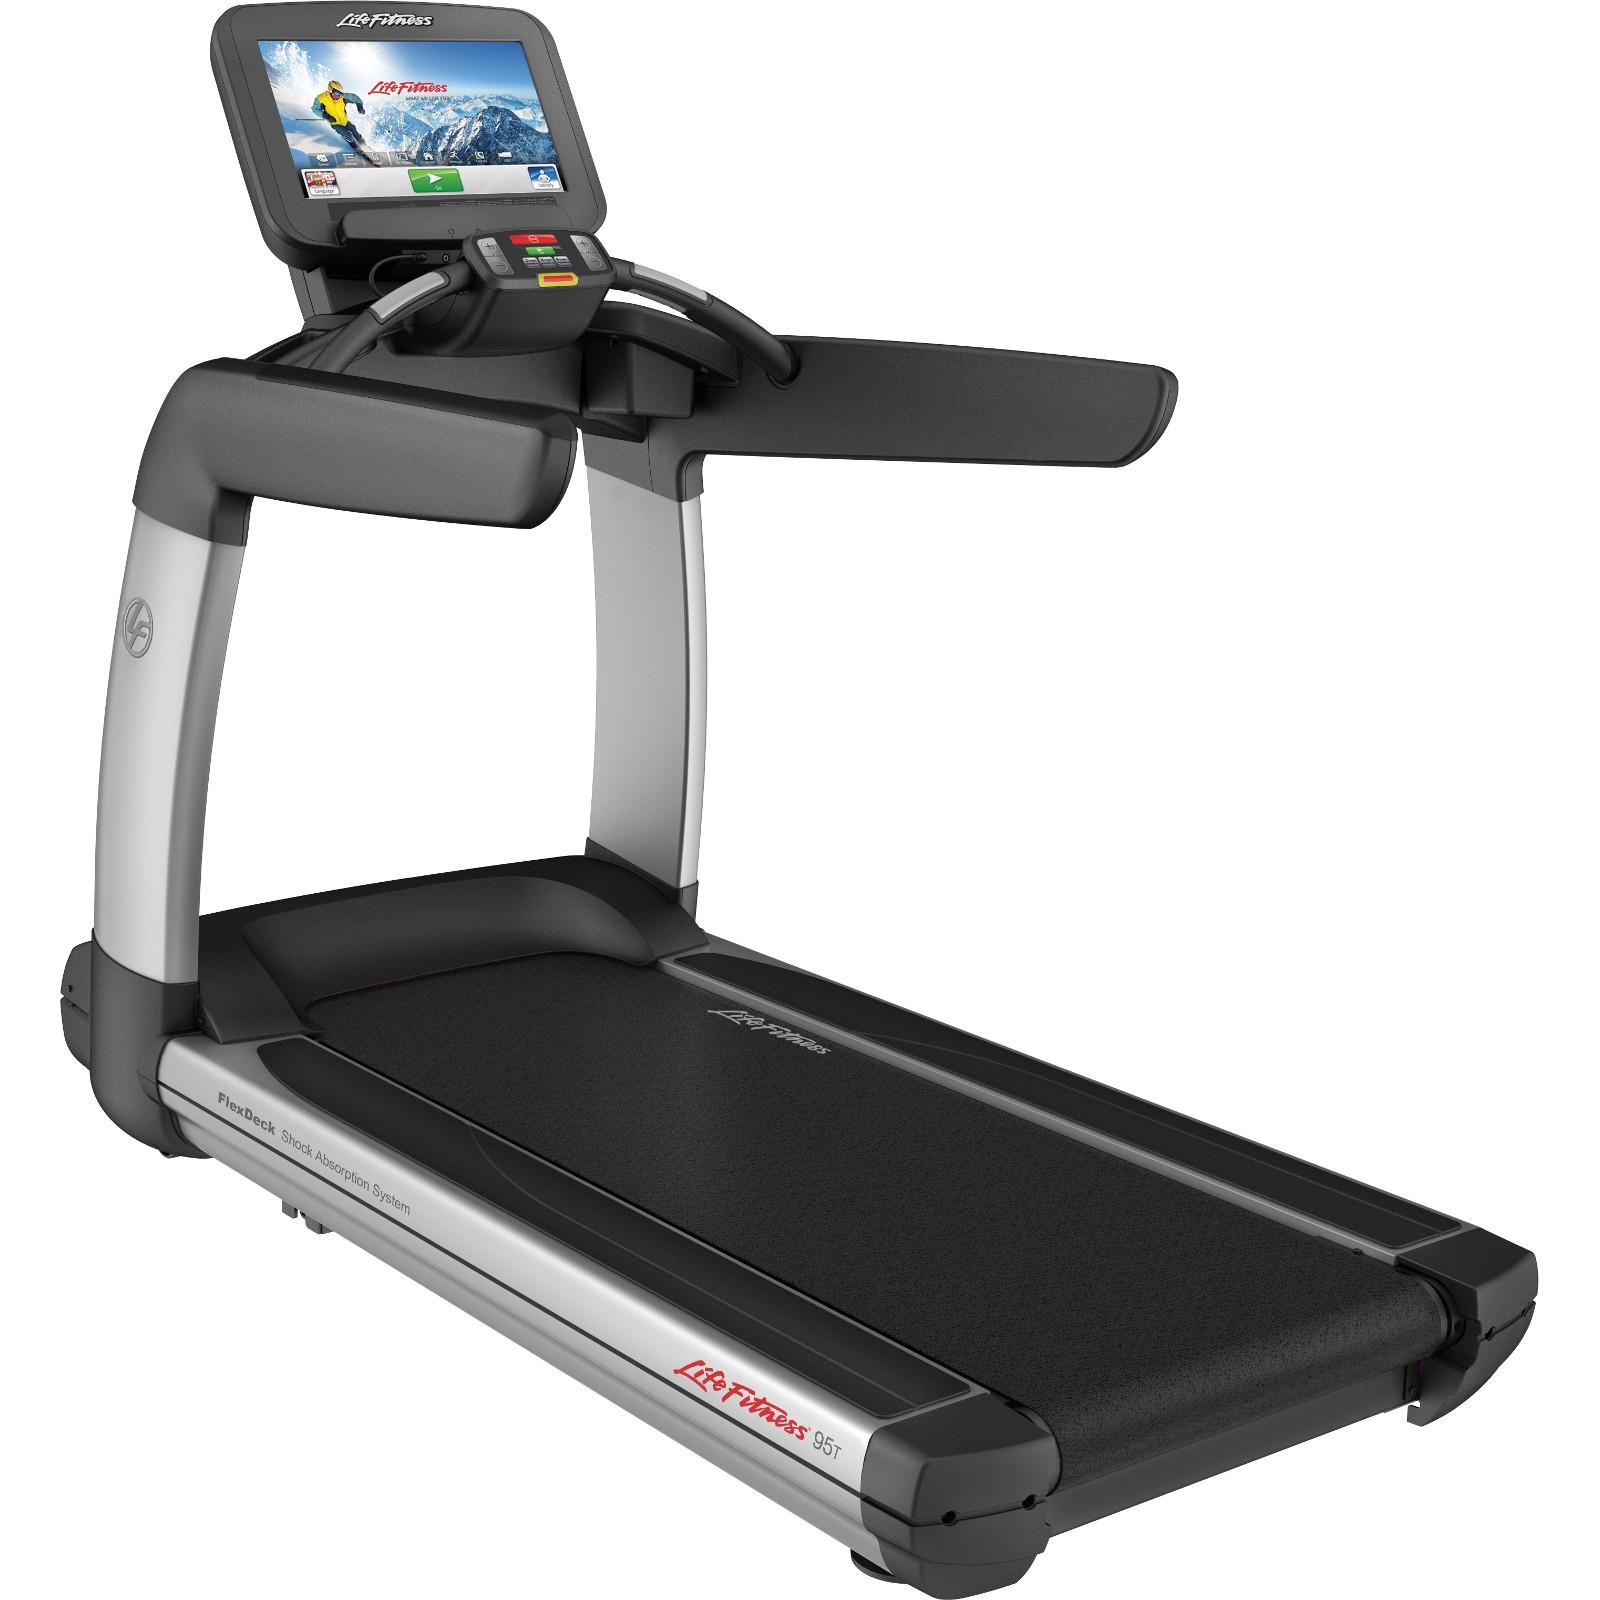 Life fitness platinum club series discover se3 treadmill for Gym life fitness